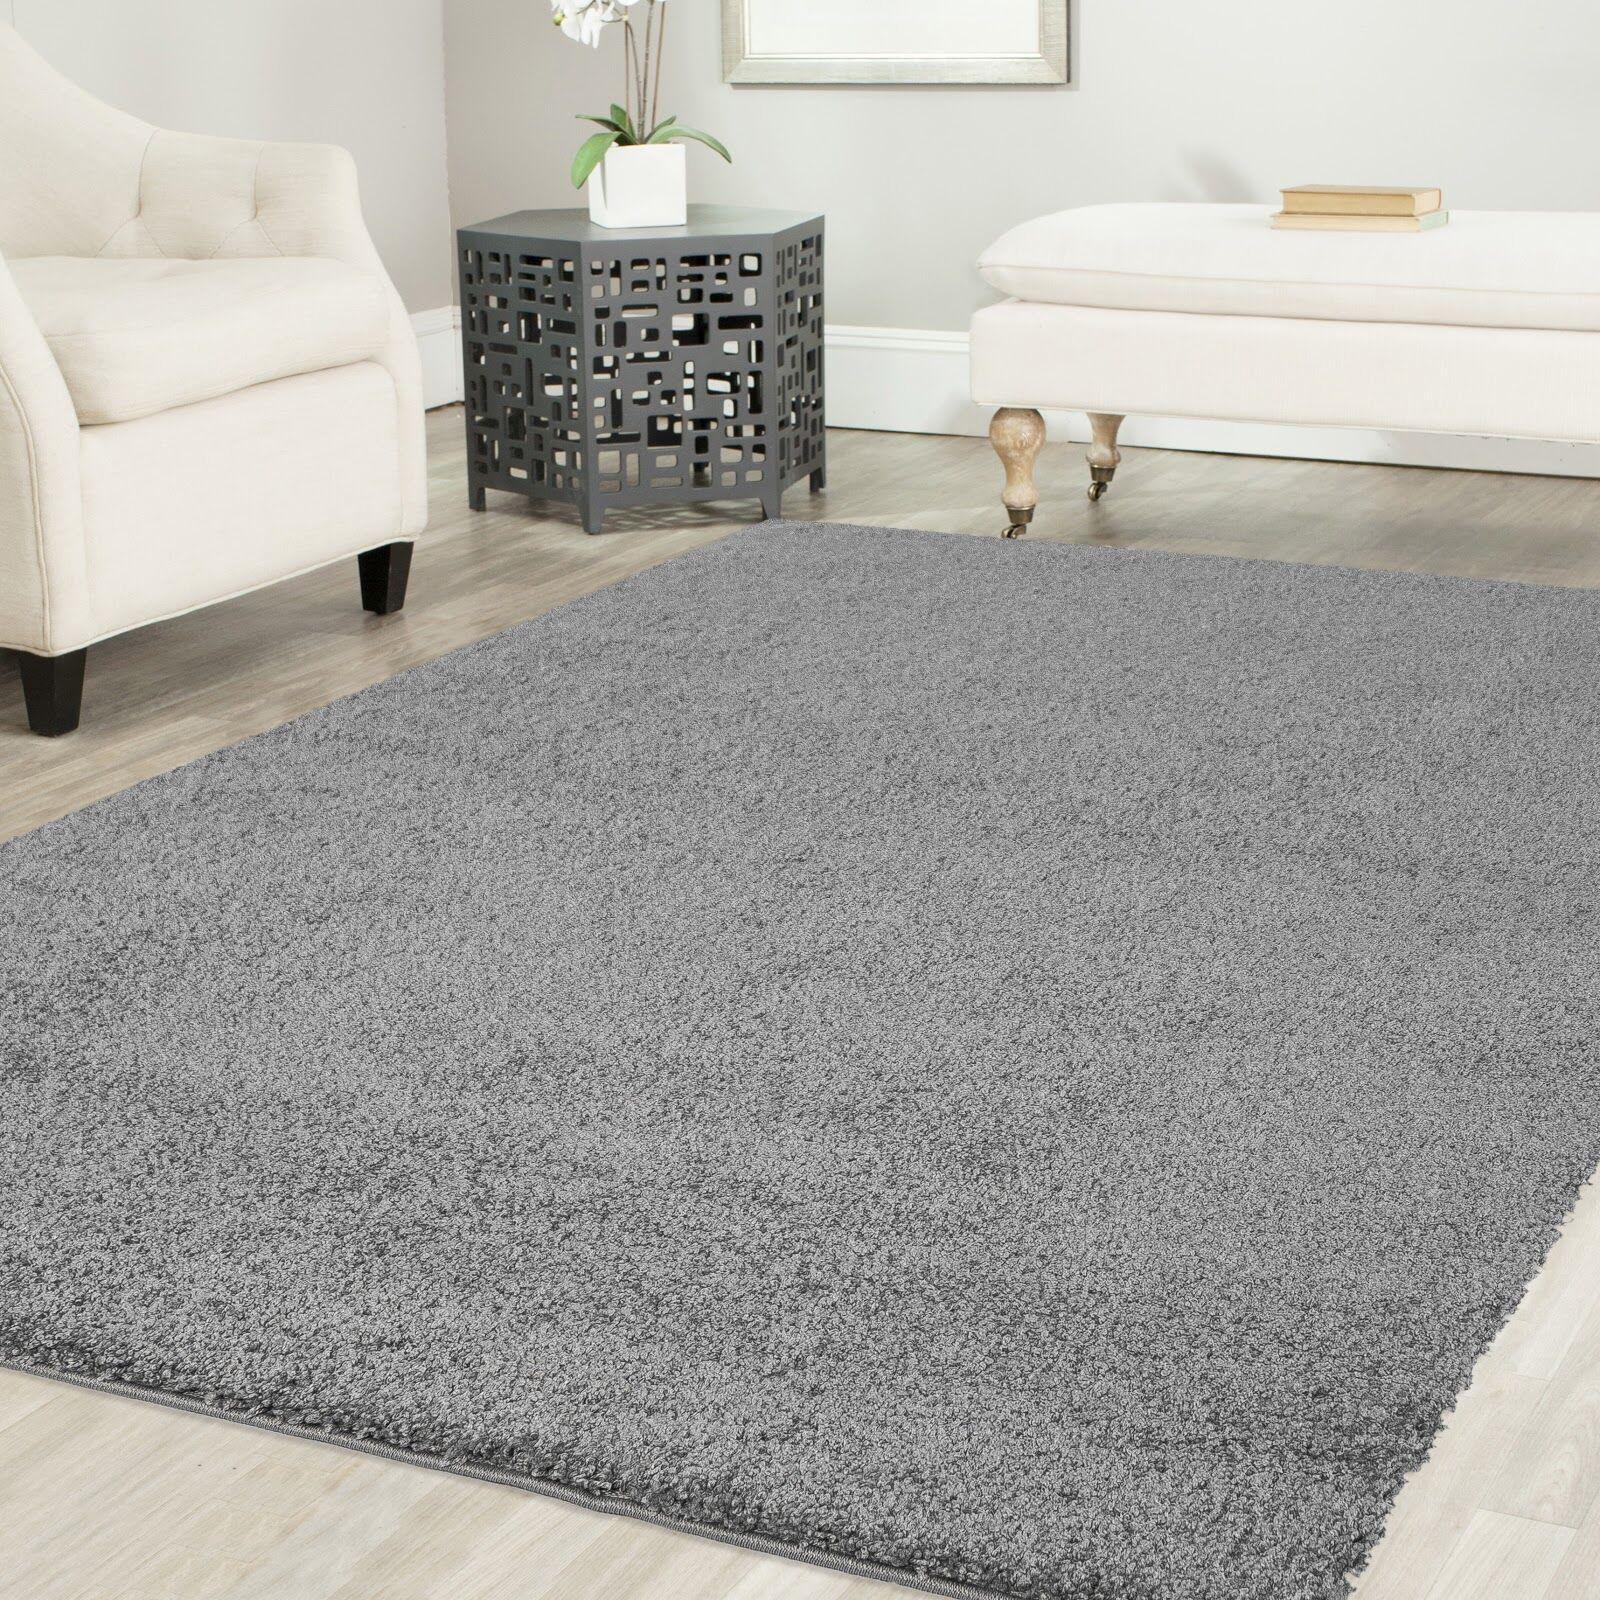 Gassin Shag Gray Area Rug Rug Size: Rectangle 5' x 8'